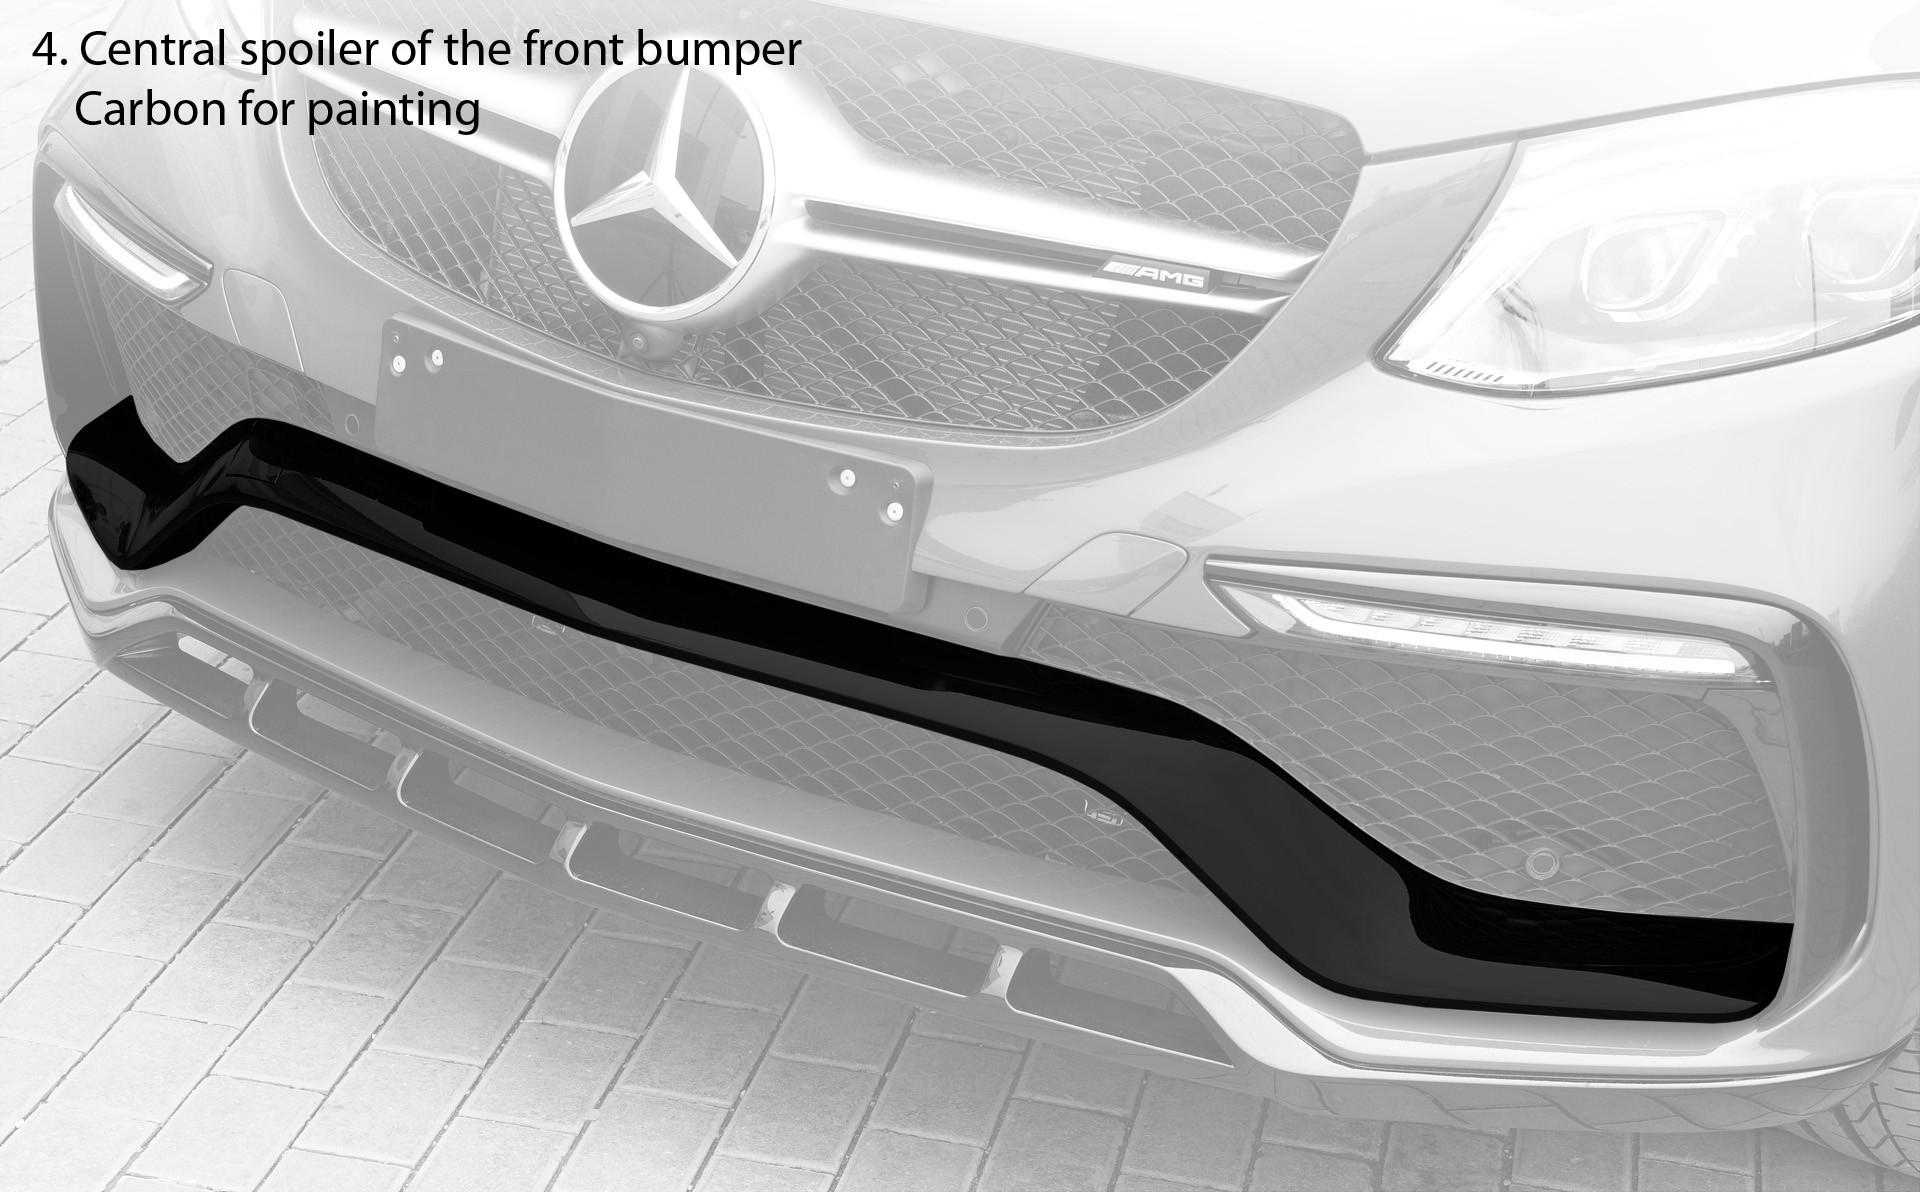 Design of a car bumper - Spoiler Of Front Bumper Center